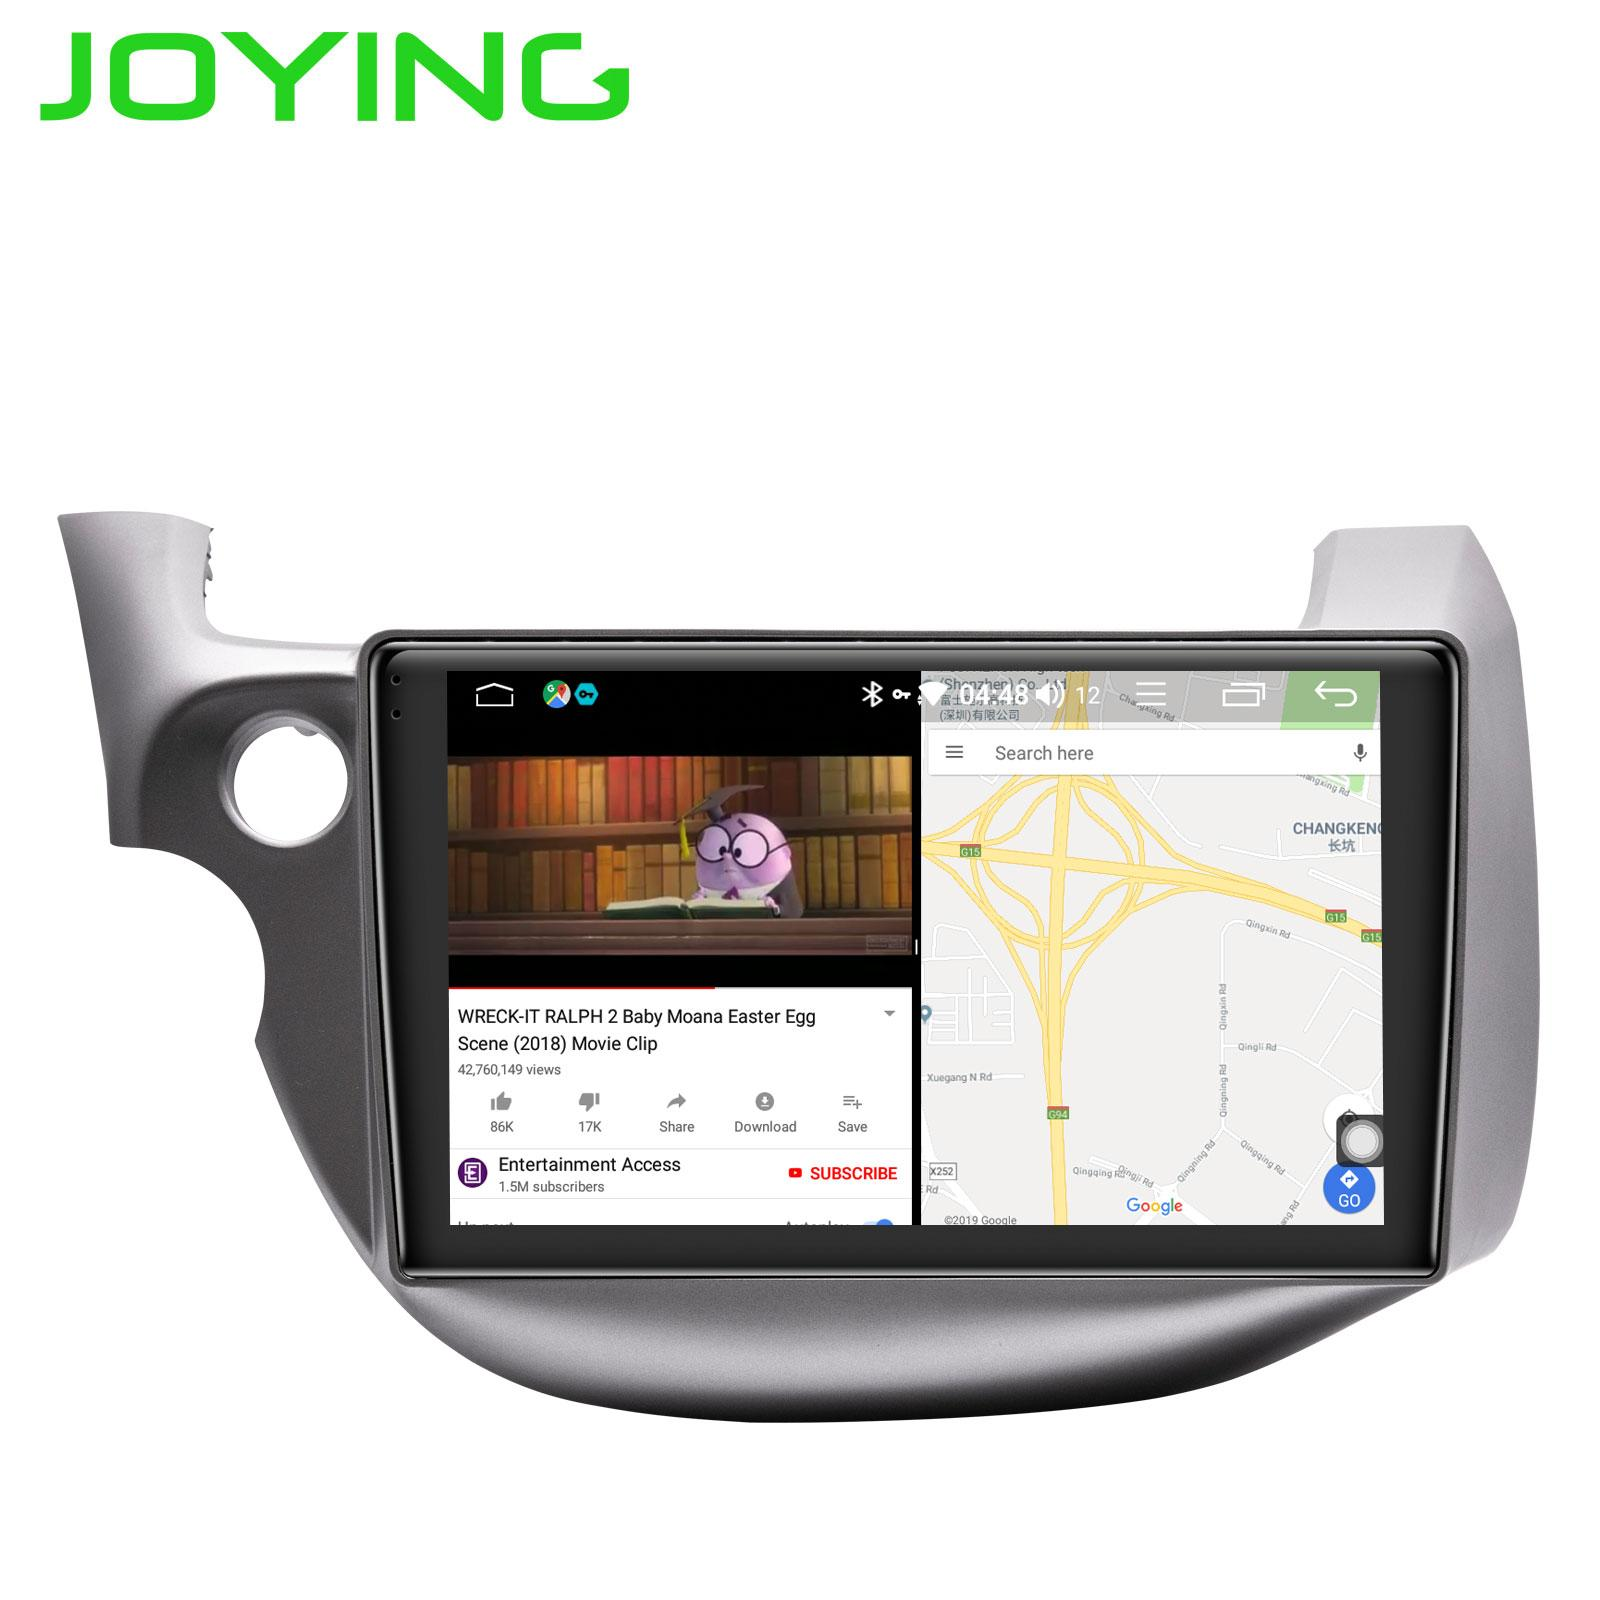 JOYING 1 din car radio Androrid 8 1 Octa Core 10 1 autoradio 4GB 32GB GPS  head unit multimedia for Honda Fit 2008-2013 DSP